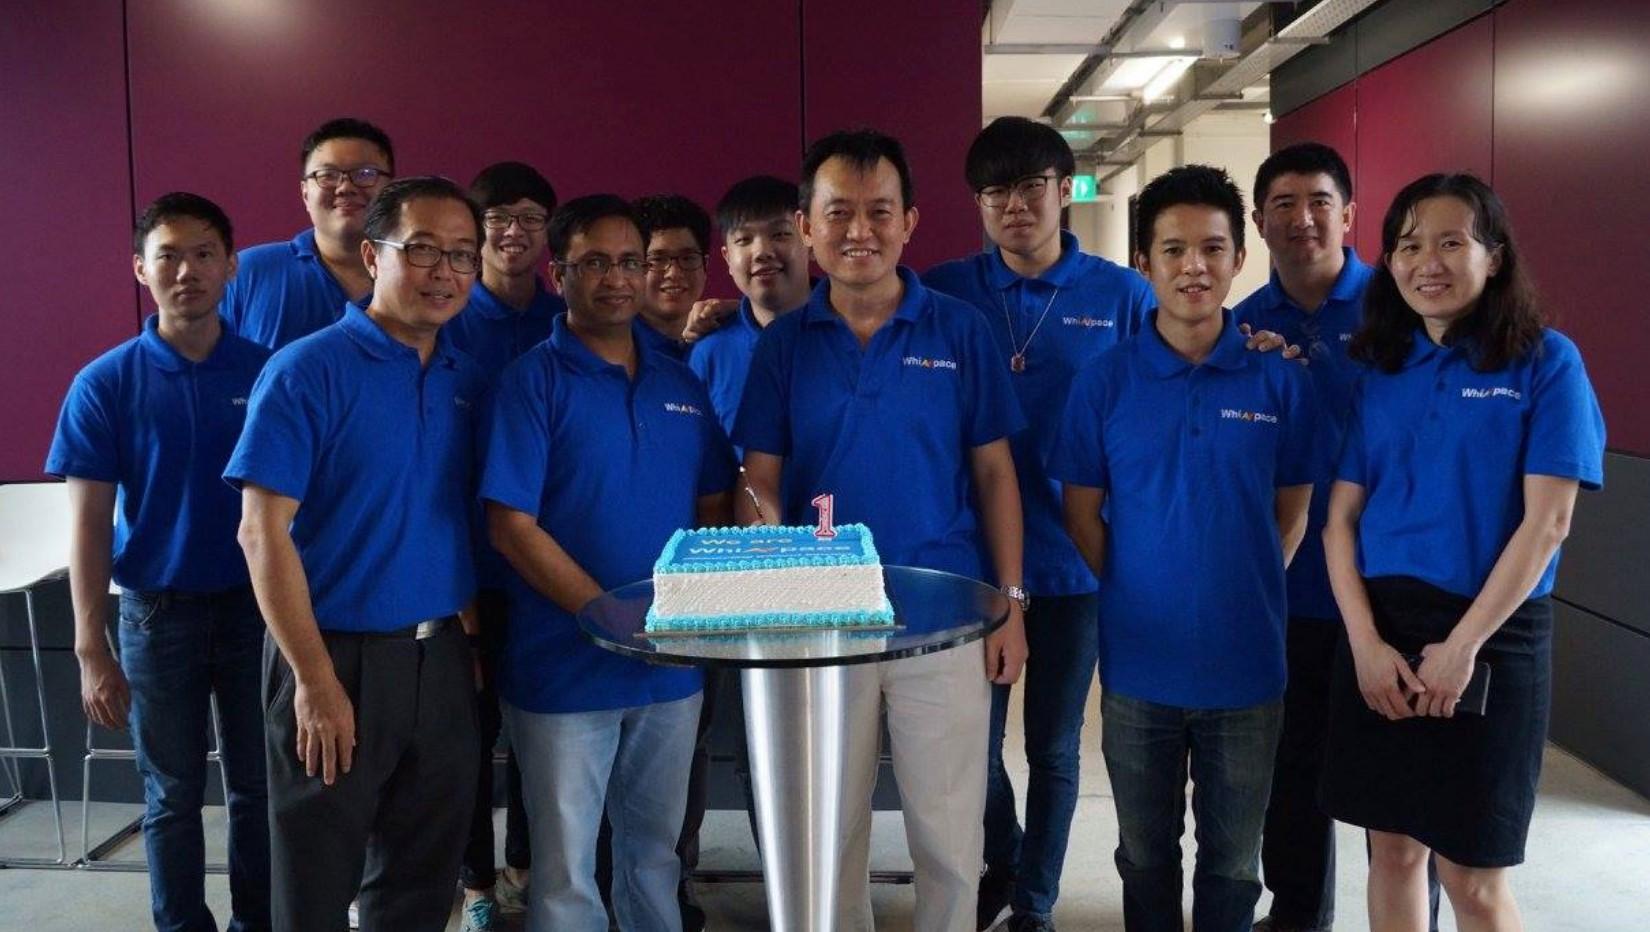 Whizpace celebratory cake